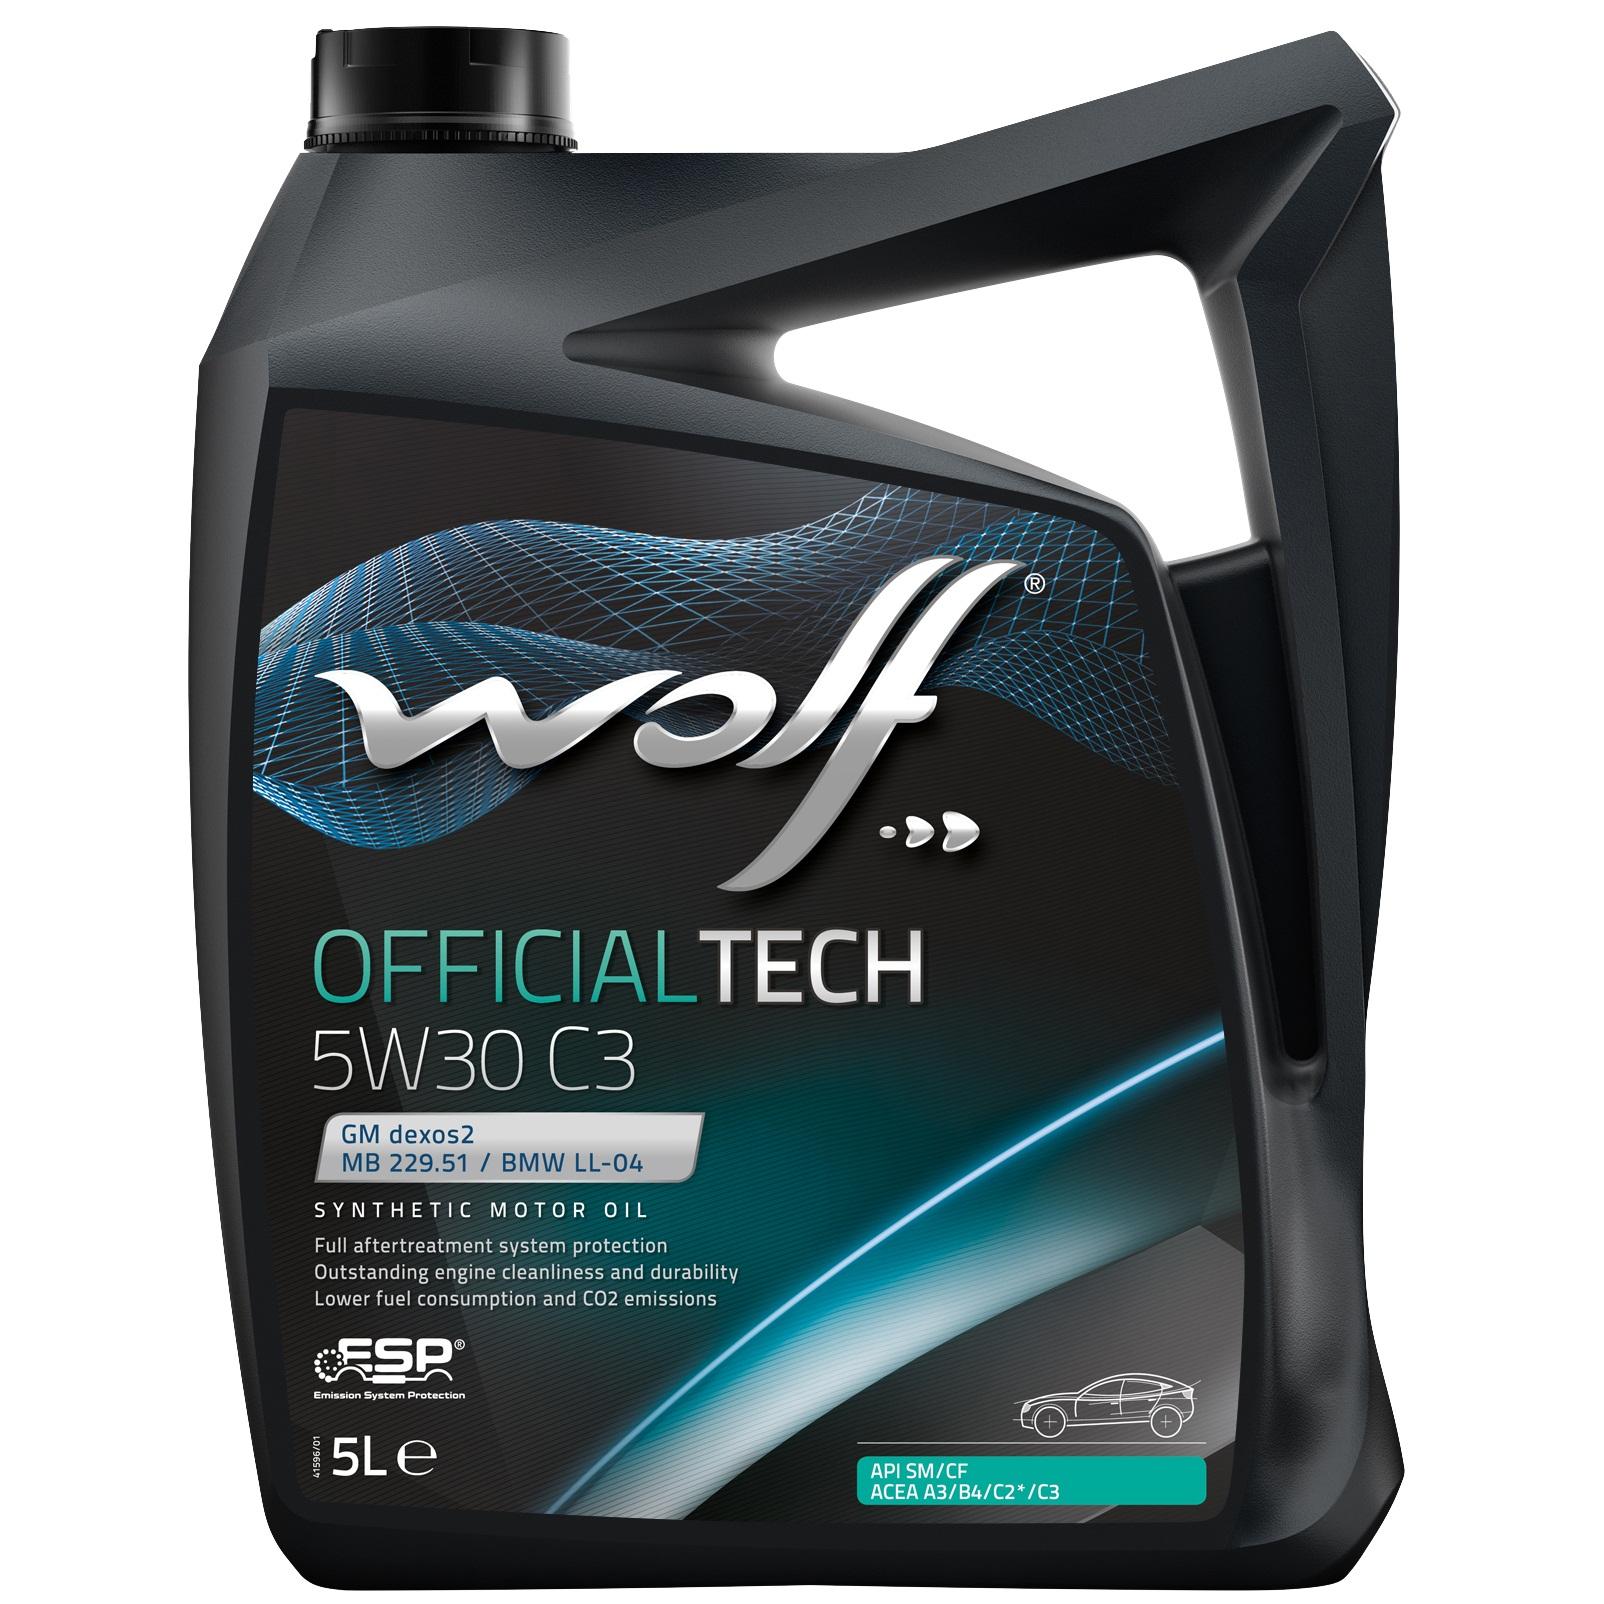 ULEI MOTOR WOLF OFFICIALTECH C3 5W30 5L